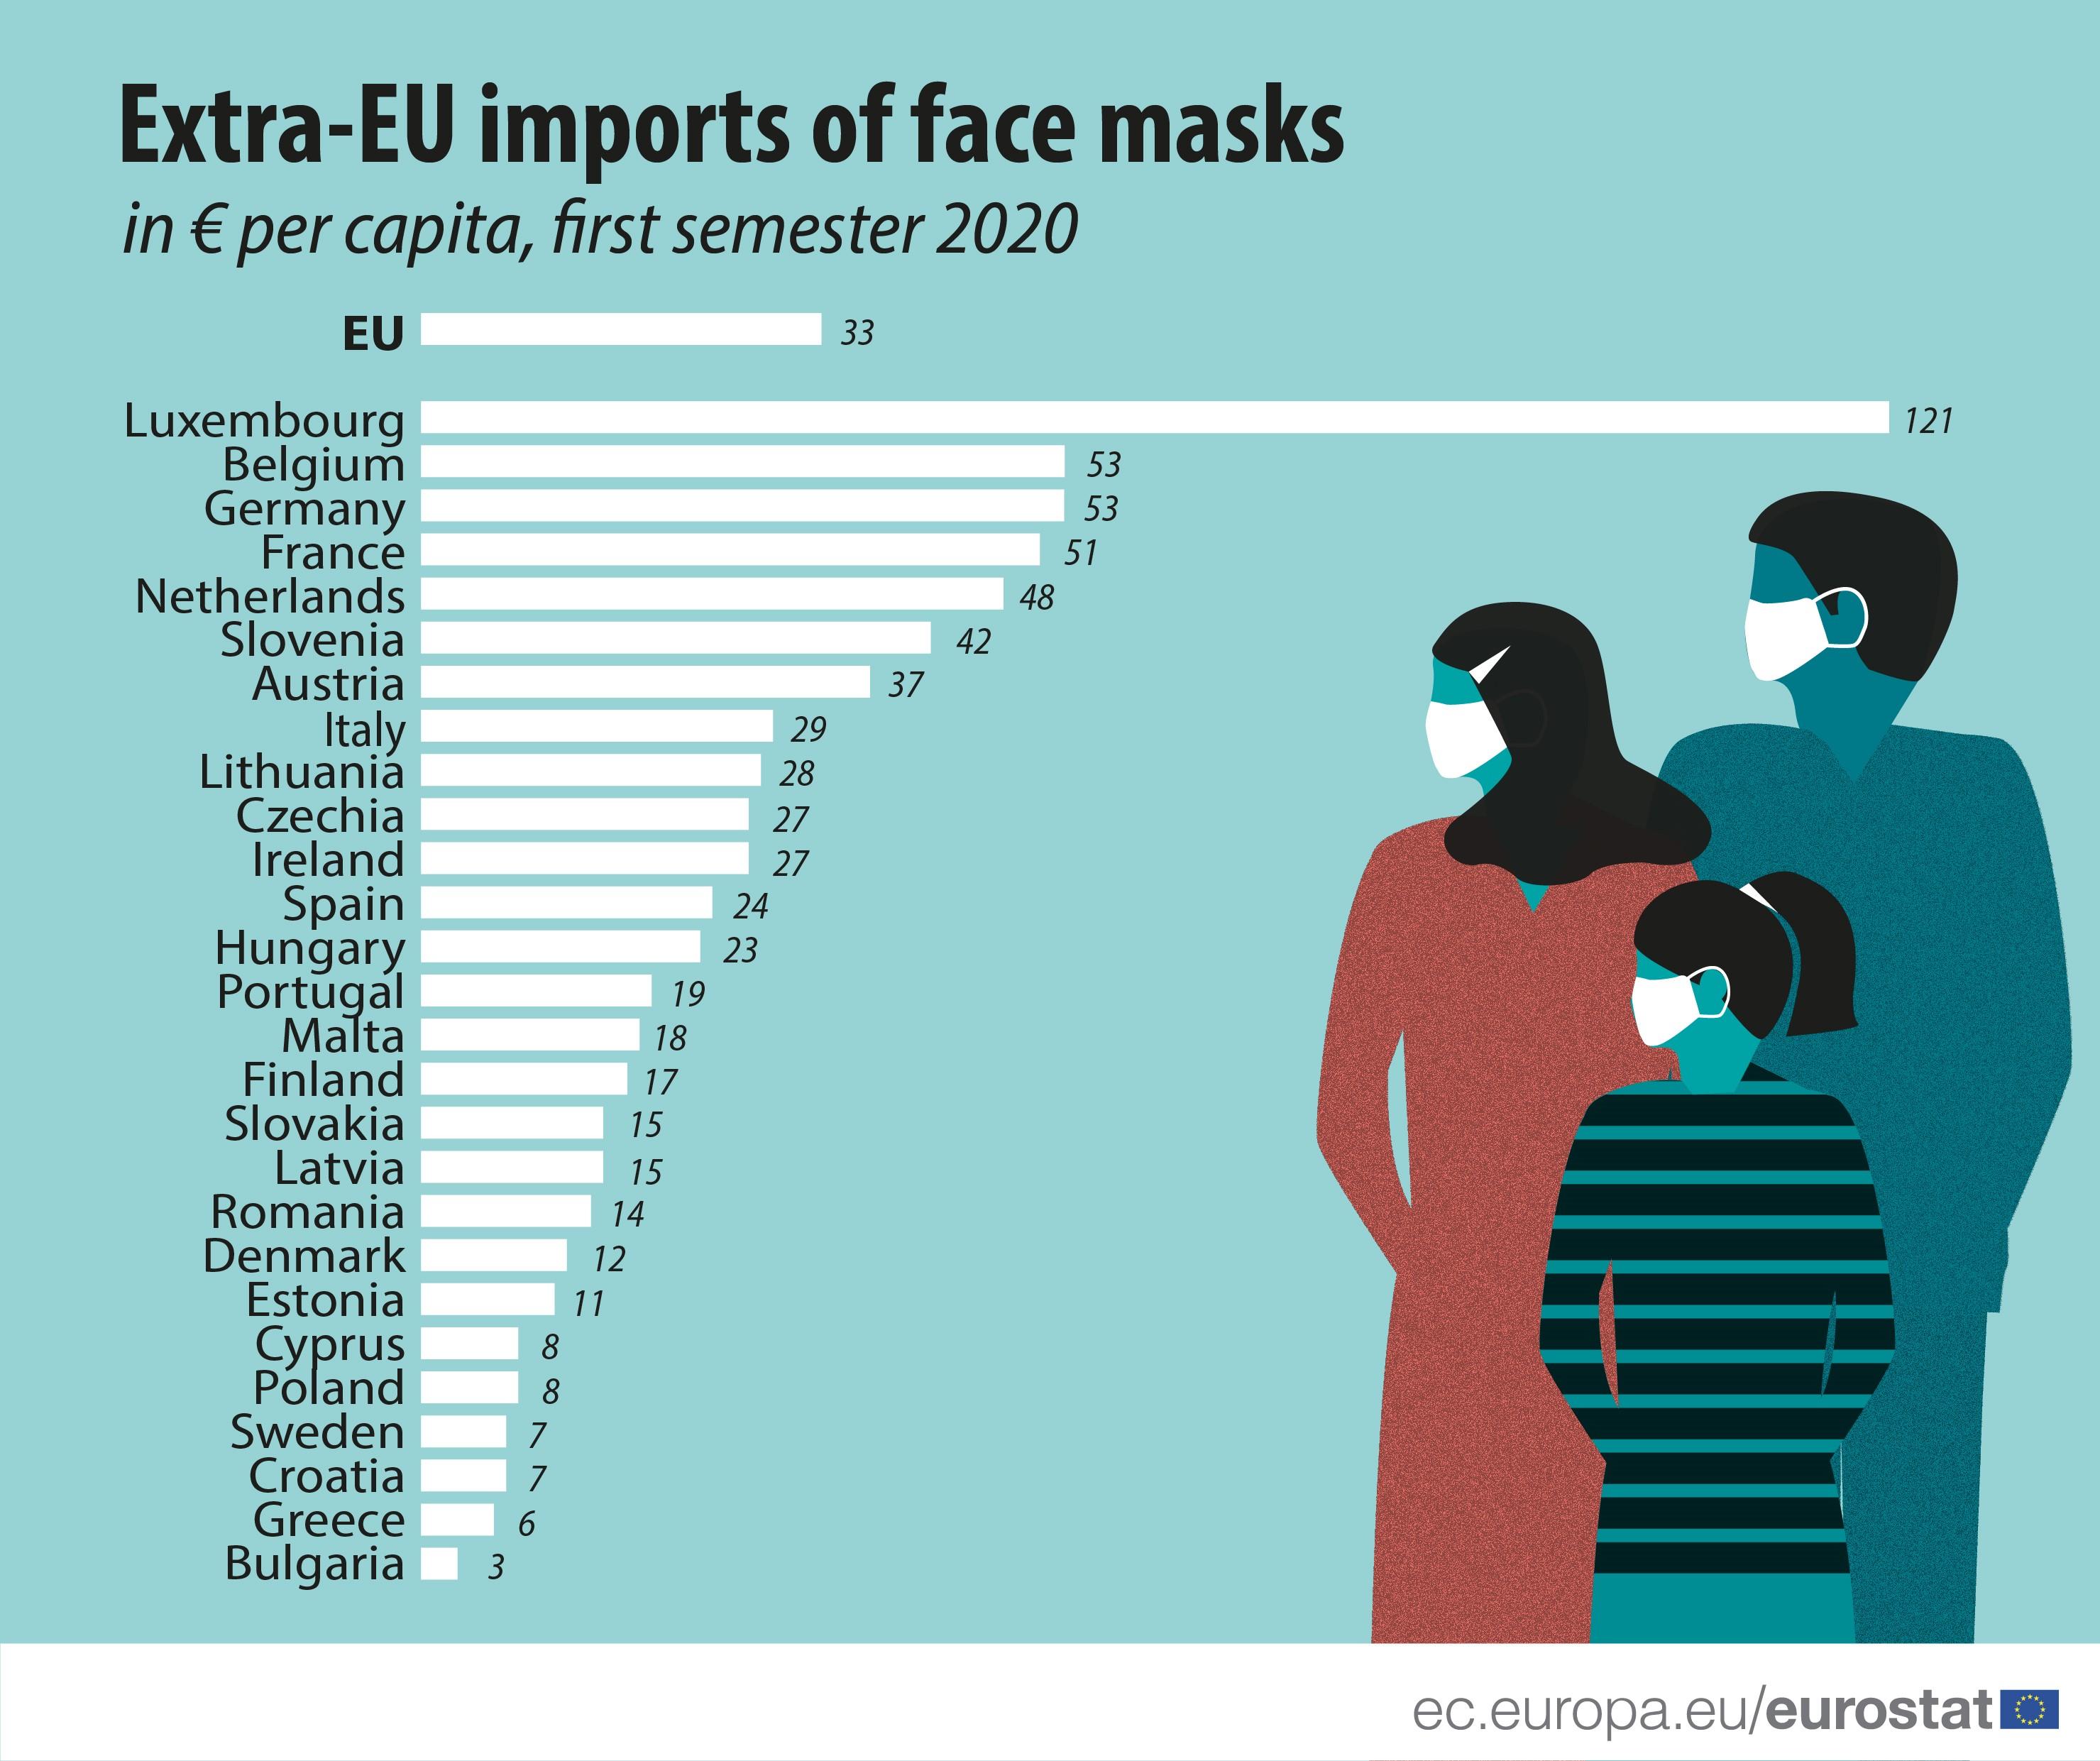 Extra-EU imports of face masks, in EUR per capita